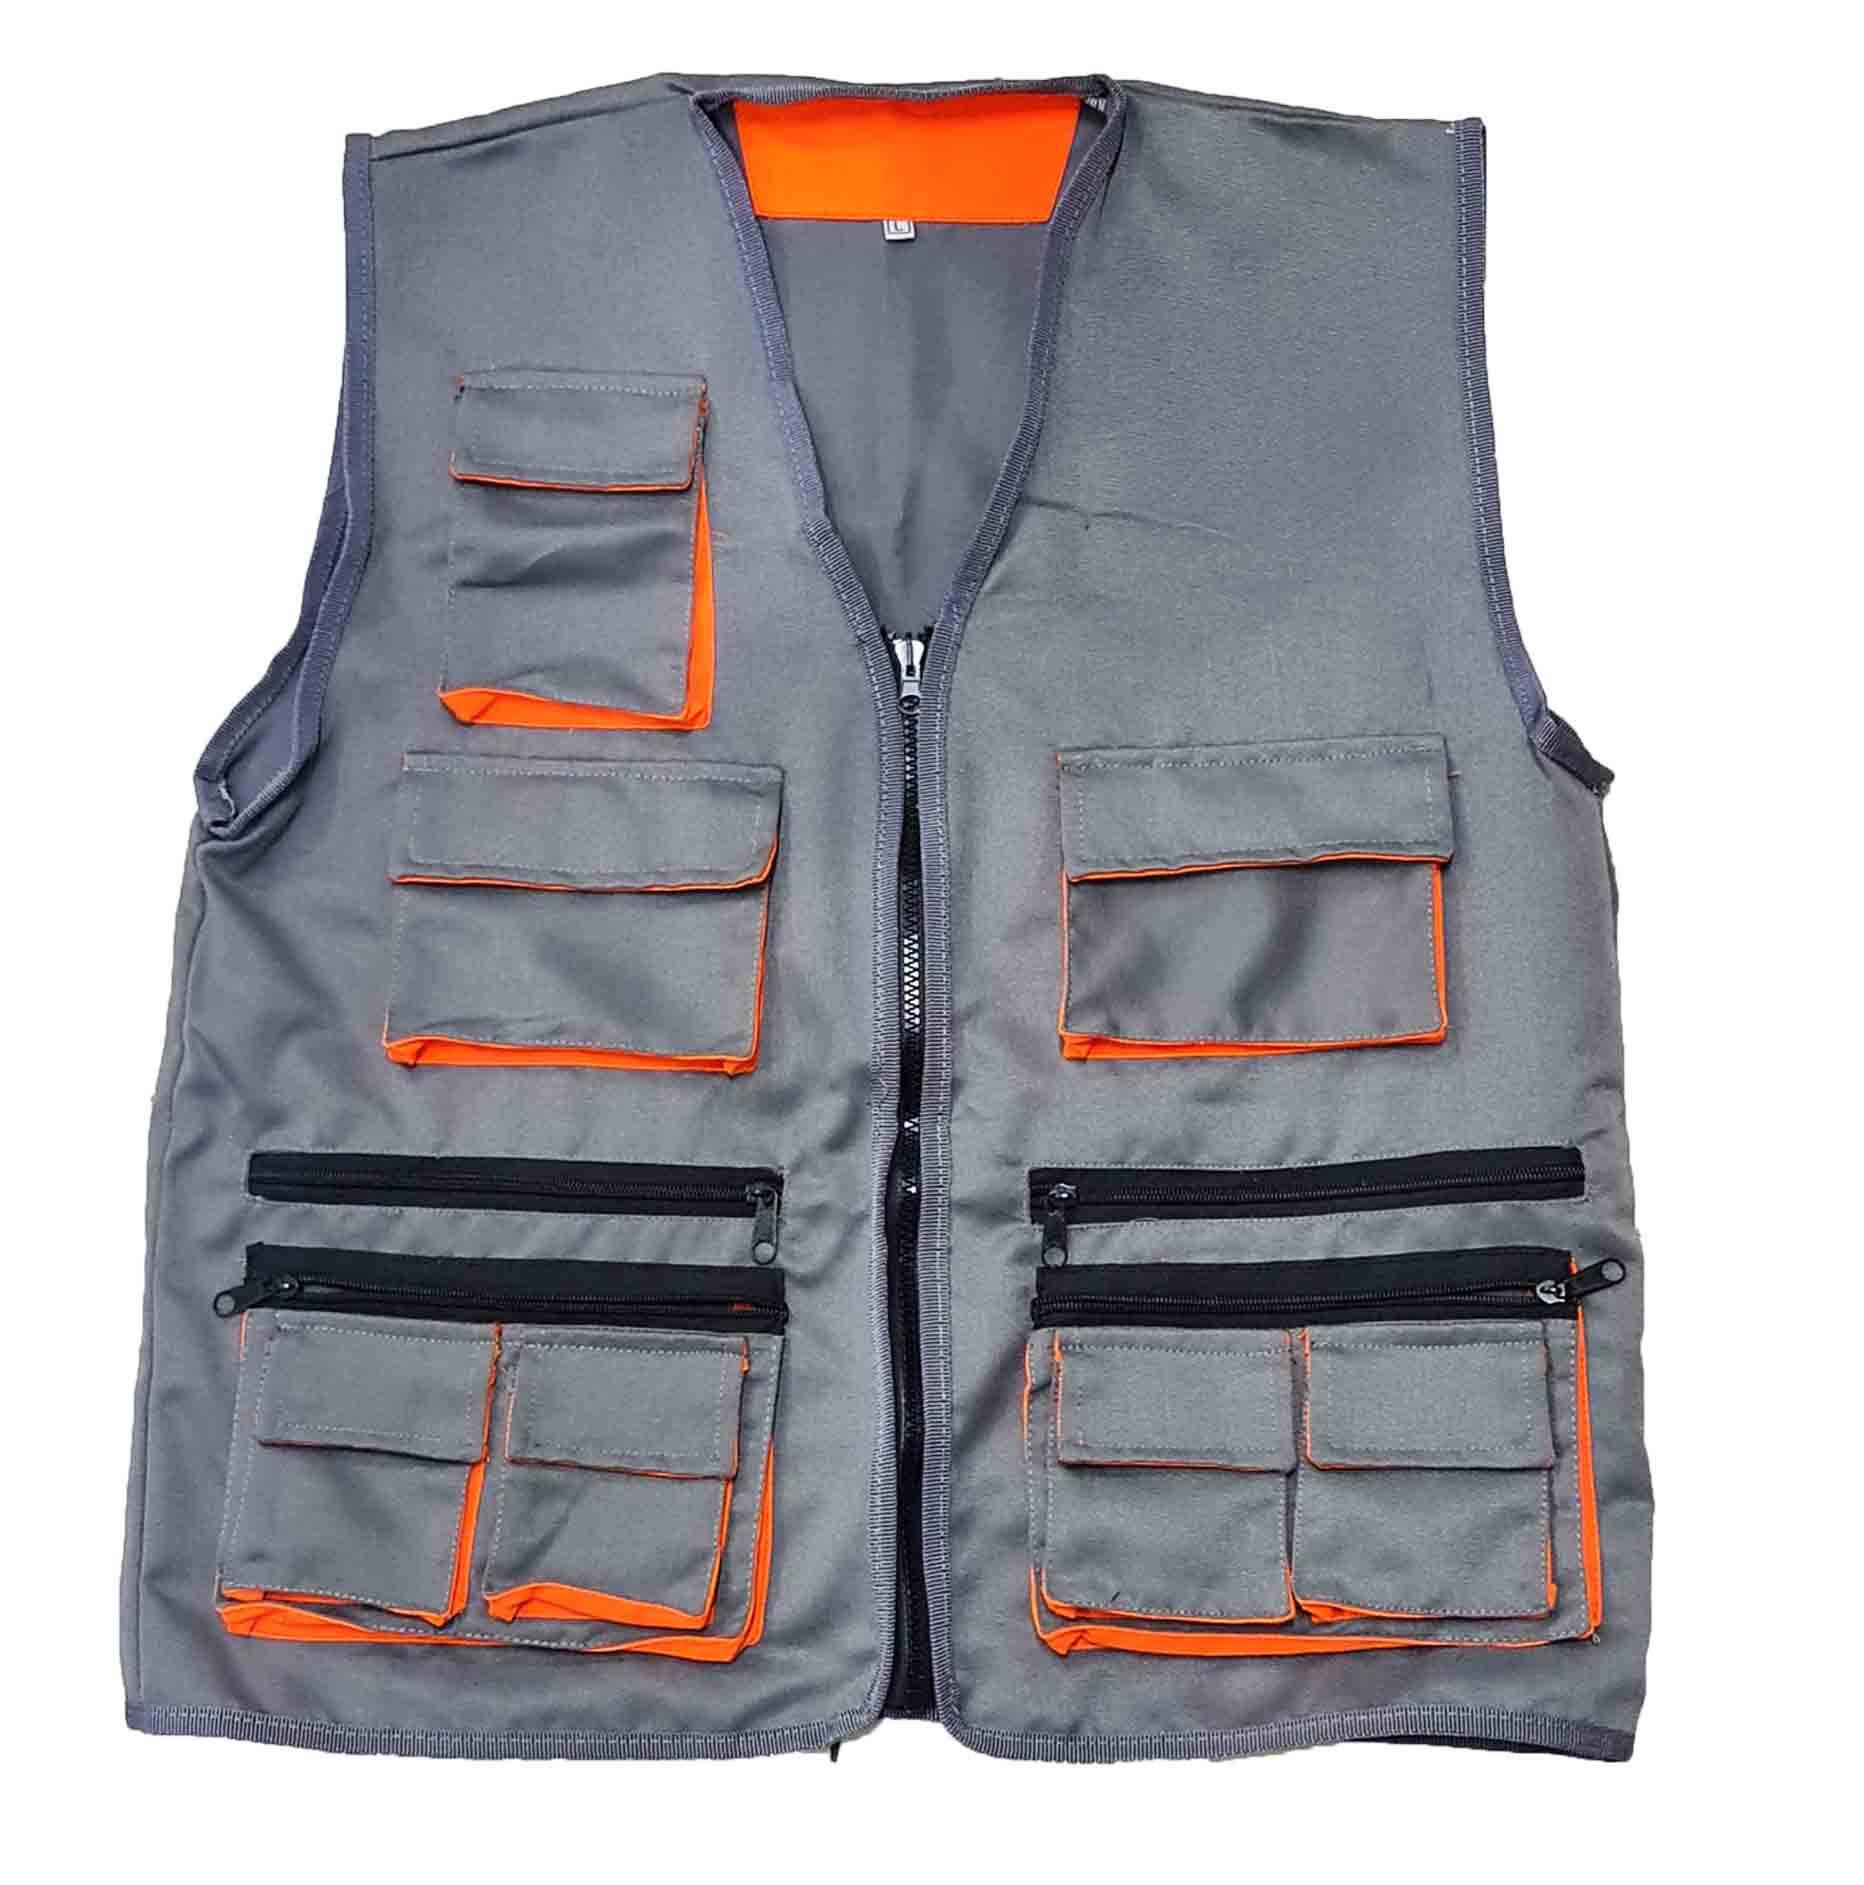 Chaleco Dril Gris/Naranja De Seguridad